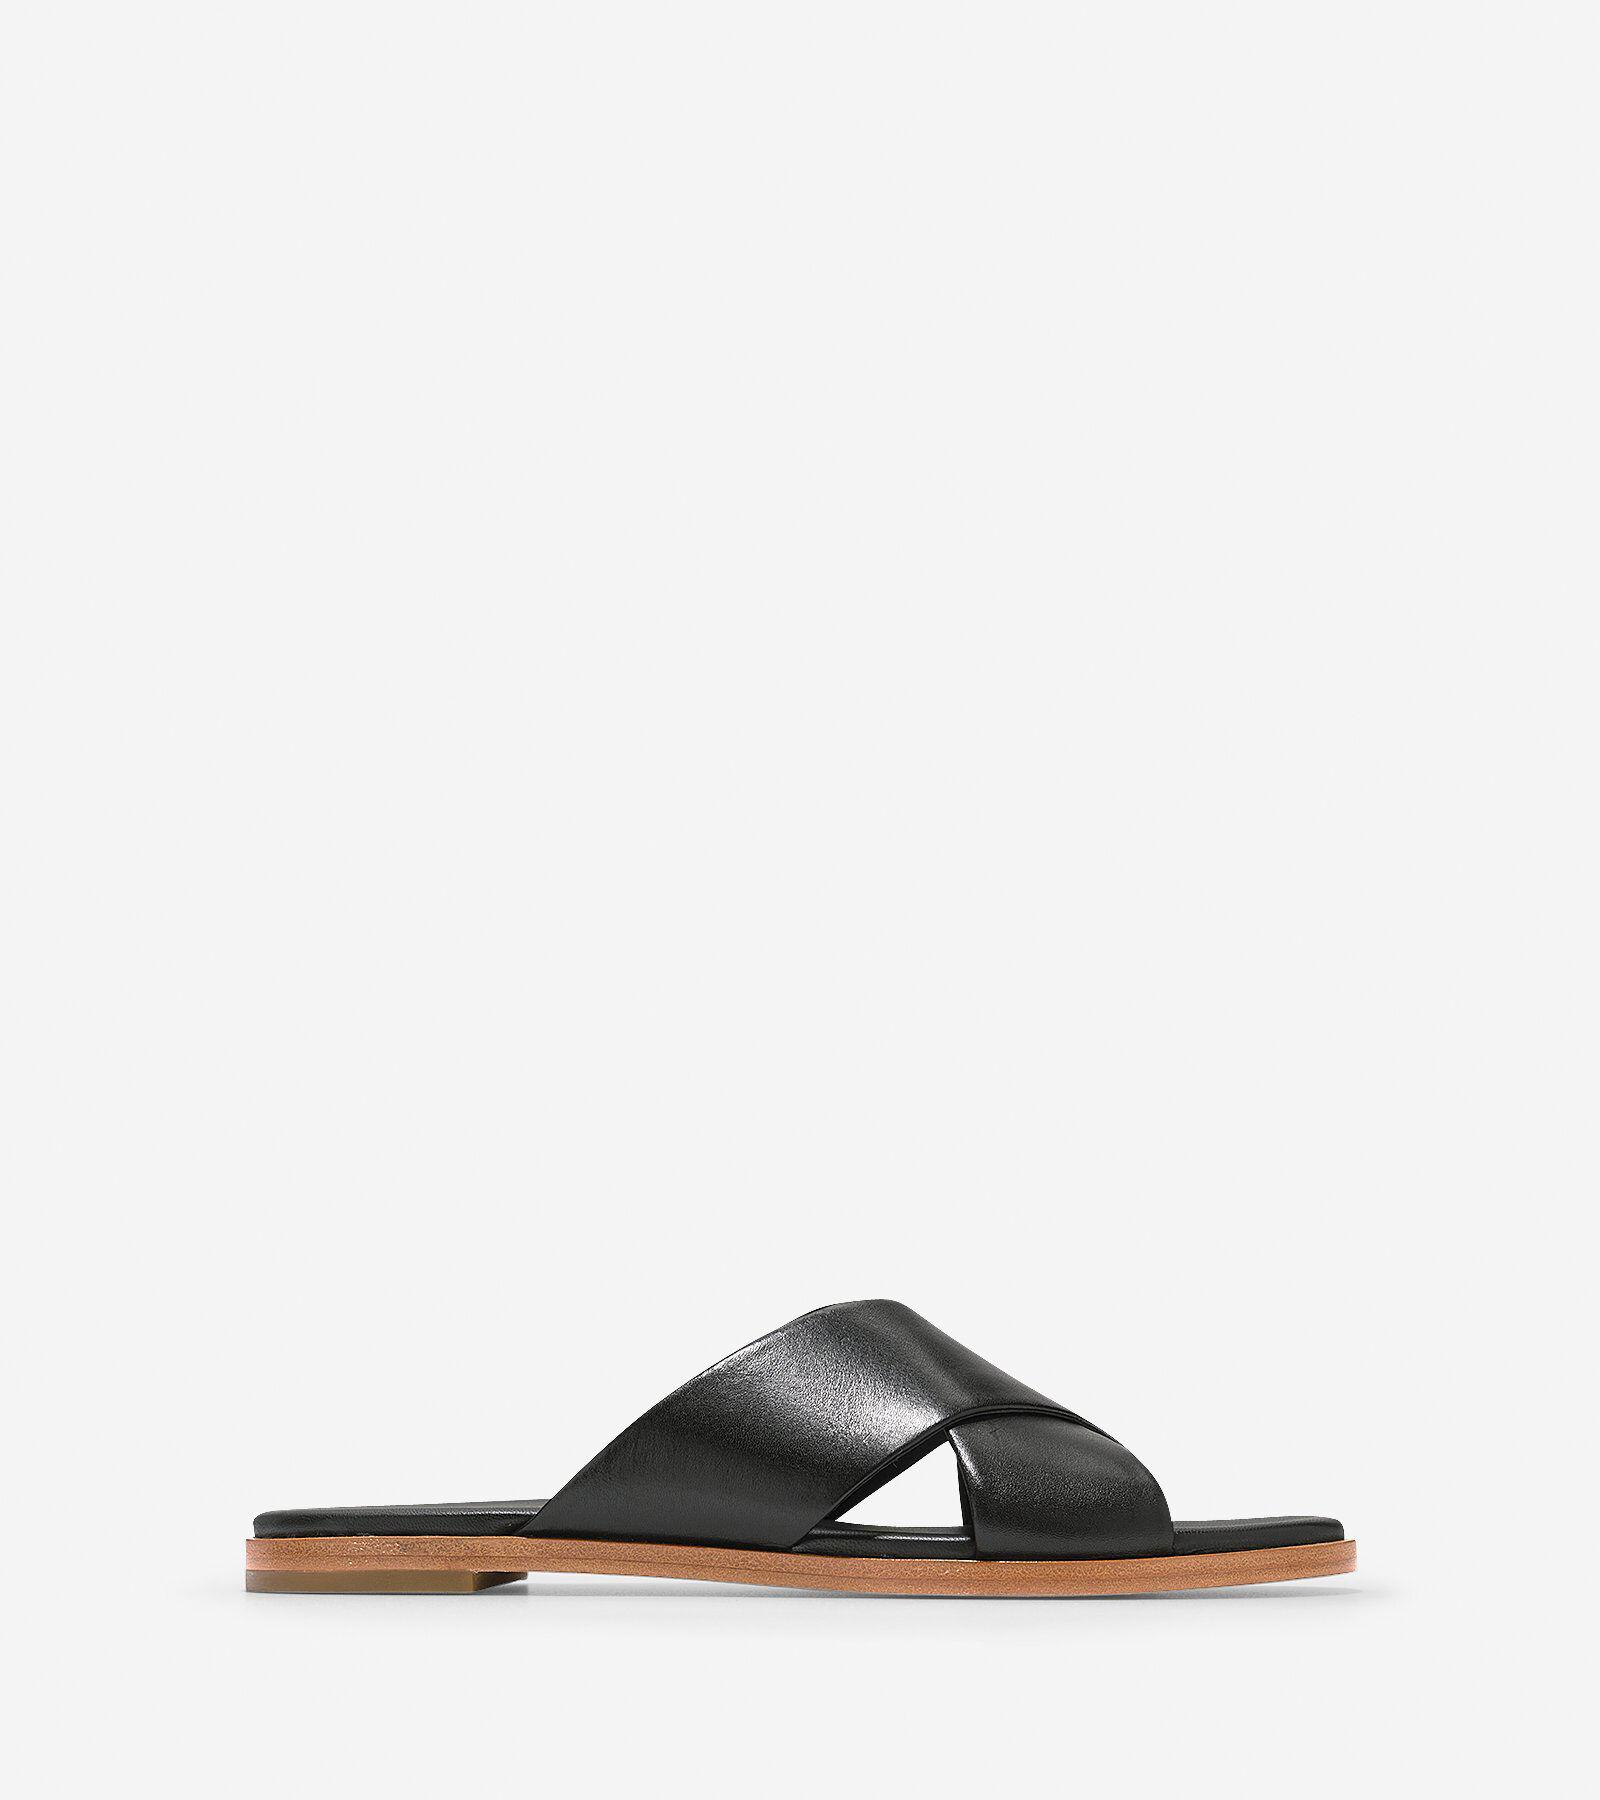 Cole Haan Women's Anica Criss Cross Sandal, Dark Grey, 10 B US